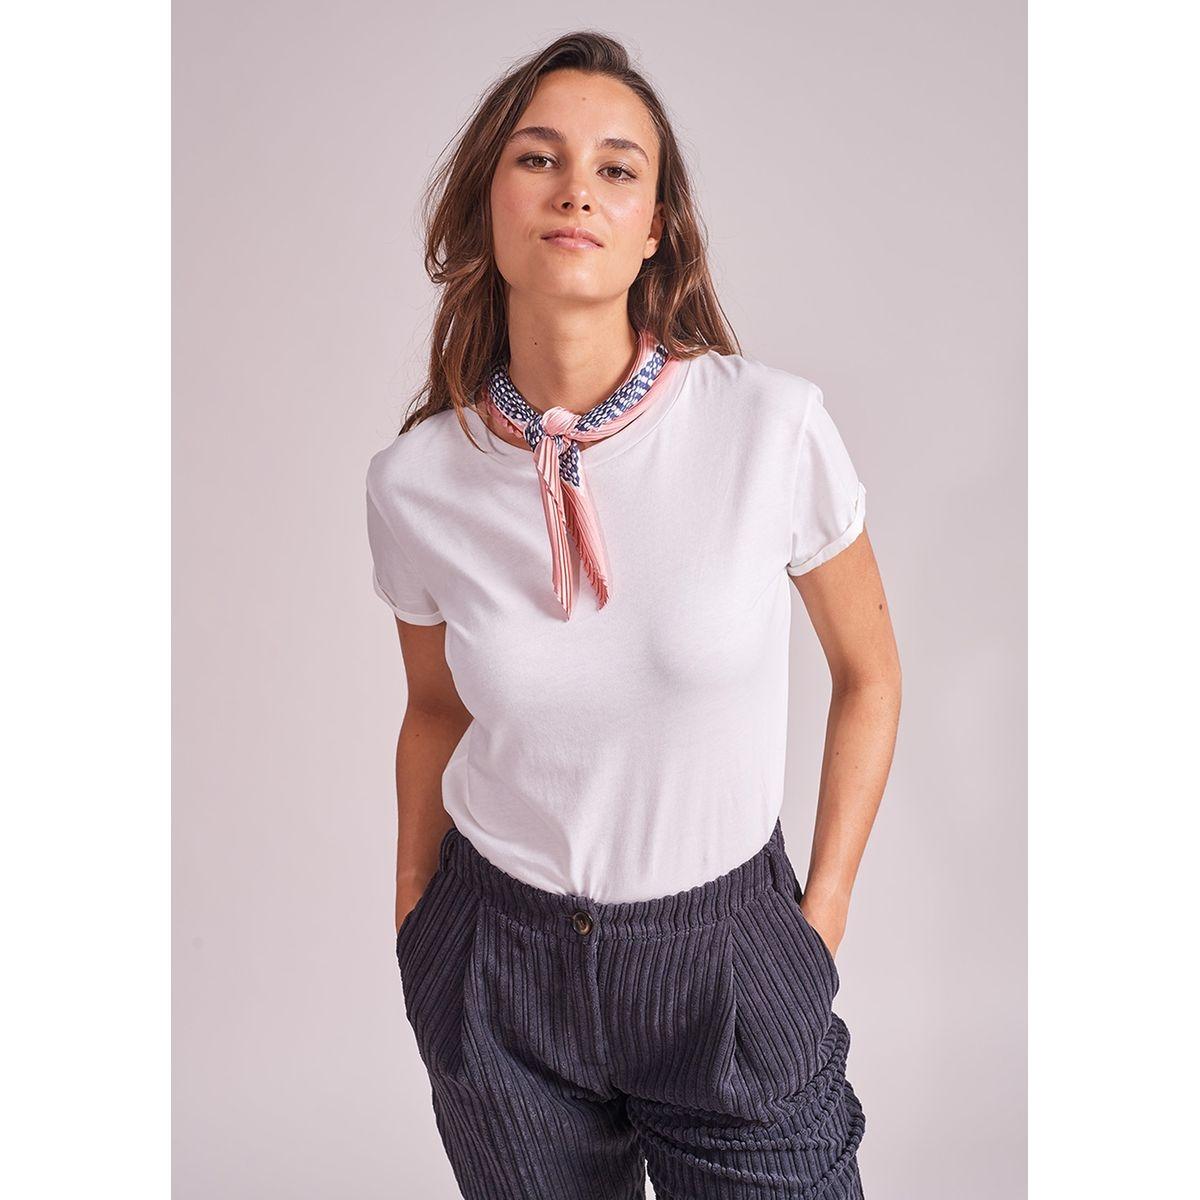 Tee-shirt avec foulard amovible